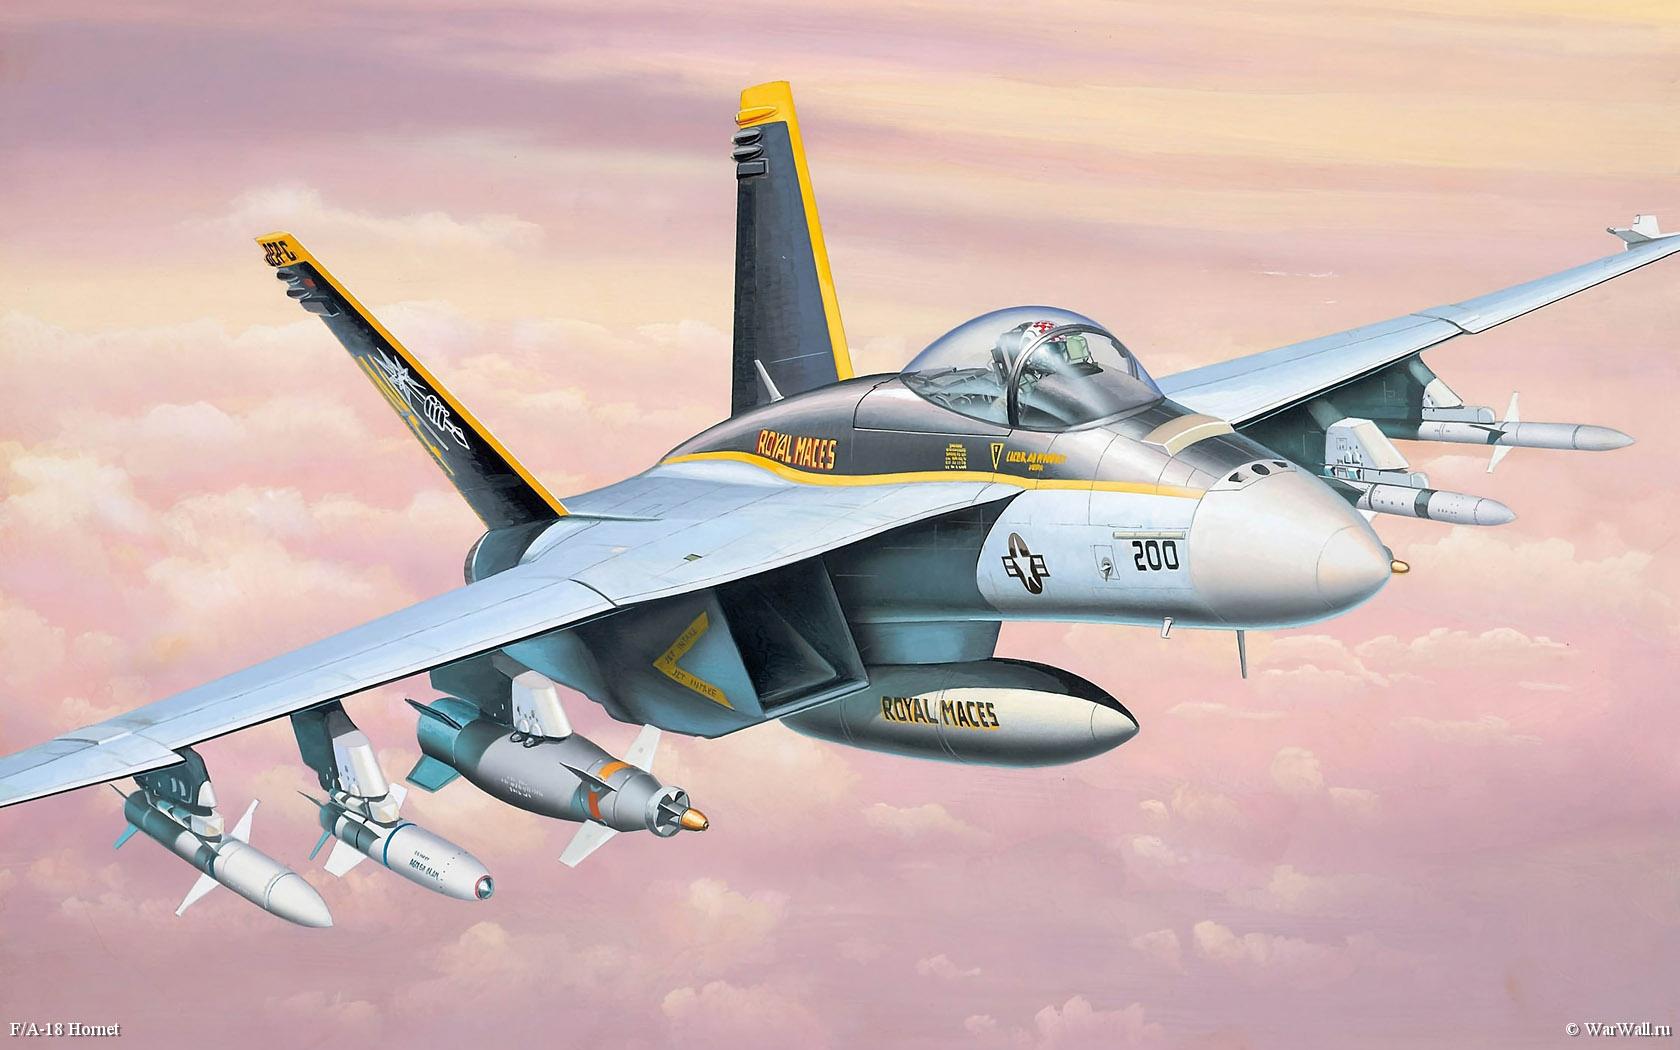 рисунок 06626 F/A-18 Hornet